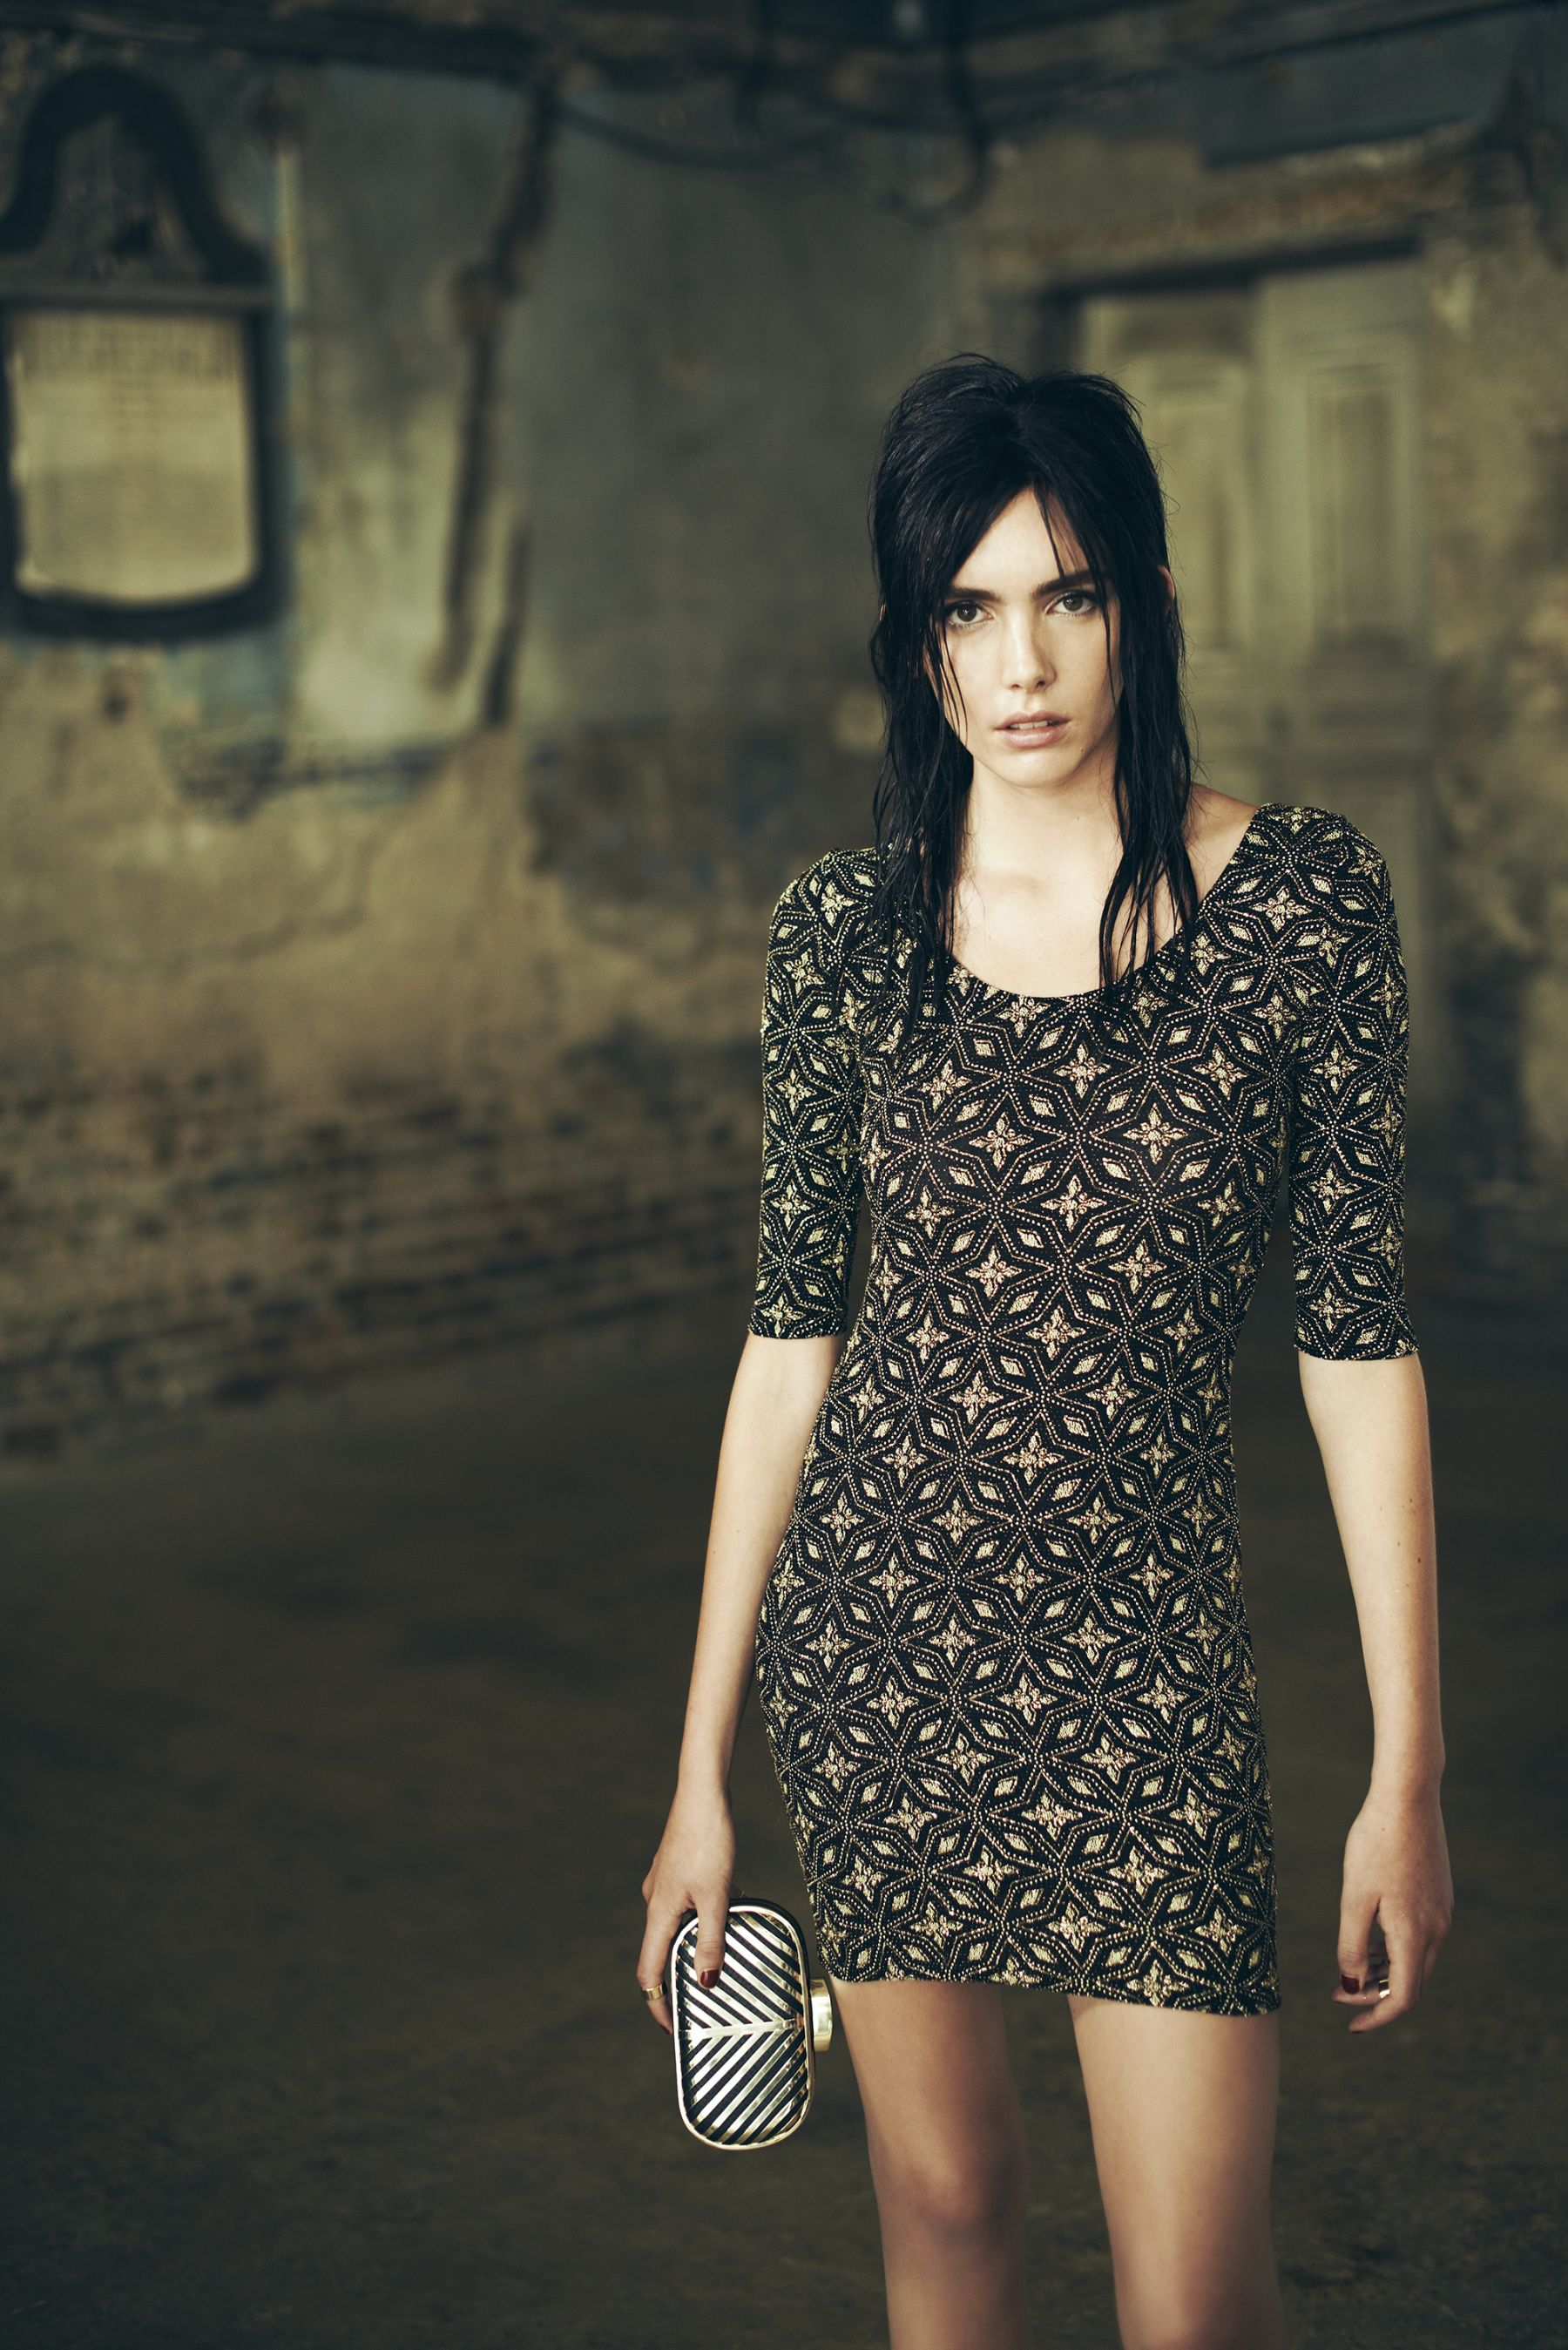 PRIMARK_DressEUR15_ClutchEUR15_RingsEUr1.50